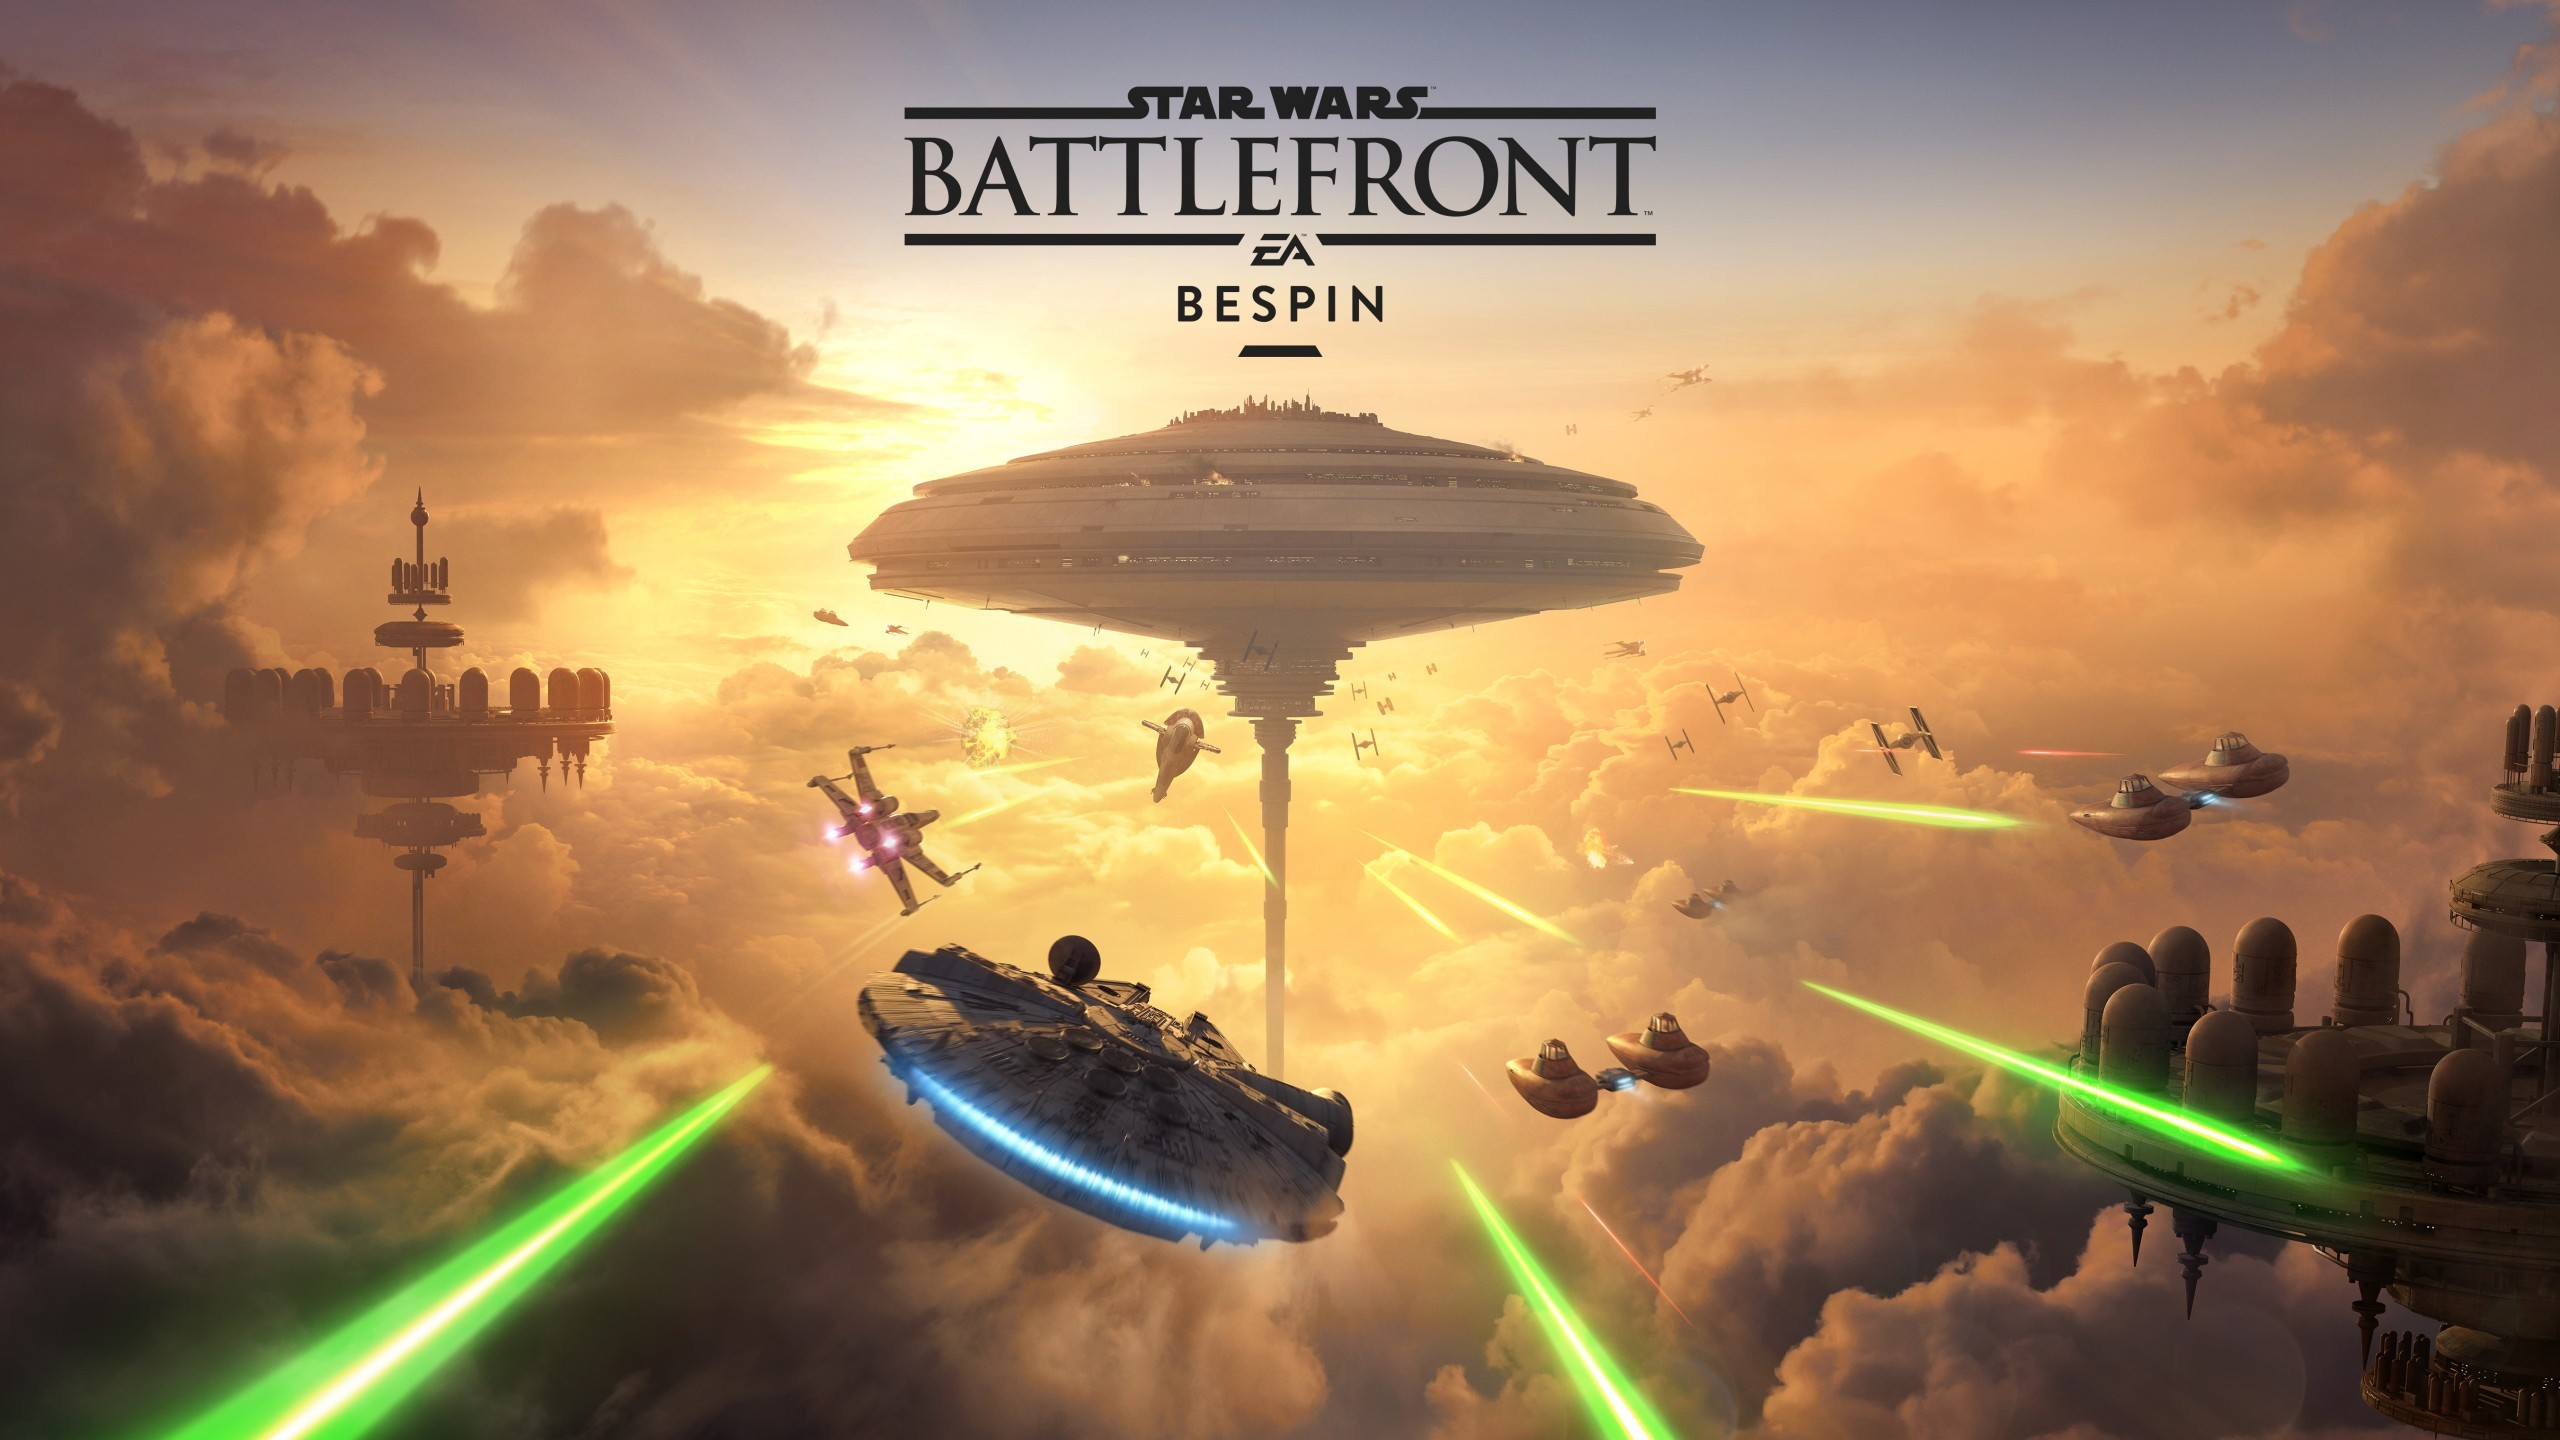 Games / Star Wars Battlefront Wallpaper